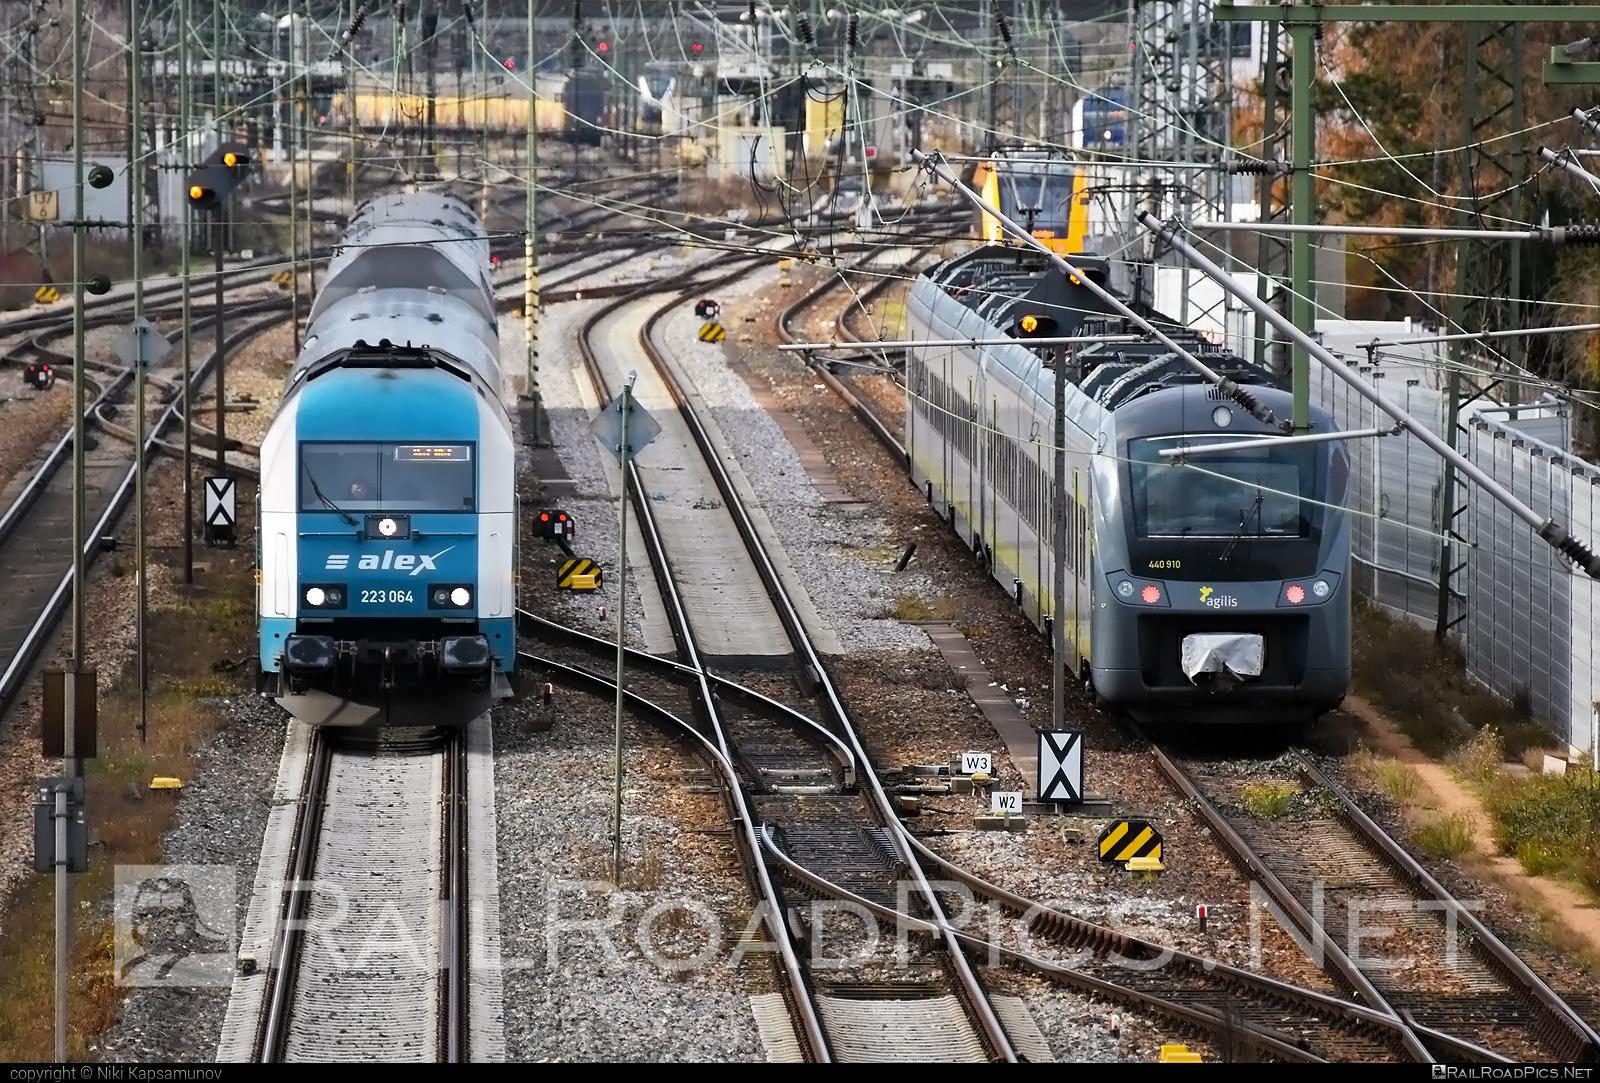 Alstom Coradia Continental - 440 910 operated by Agilis Verkersgesellschaft mbH & Co KG #agilis #agilisverkersgesellschaft #alstom #alstomcoradia #alstomcoradiacontinental